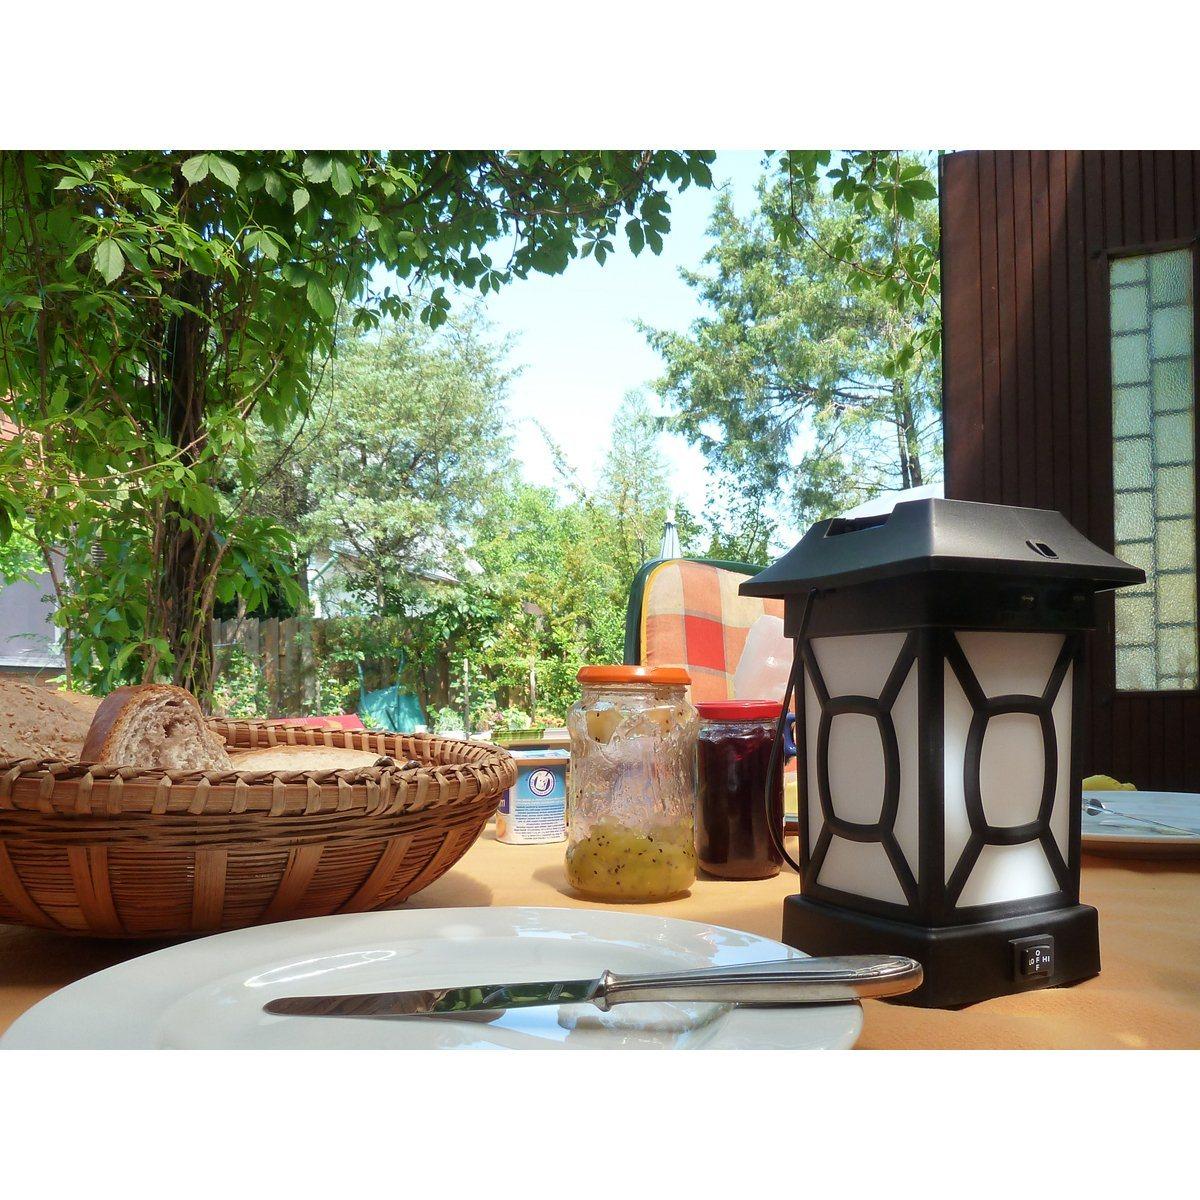 ThermaCell ThermaCell - Mückenabwehr Laterne mit LED | Dekoration > Kerzen und Kerzenständer > Laternen | Kunststoff | ThermaCell